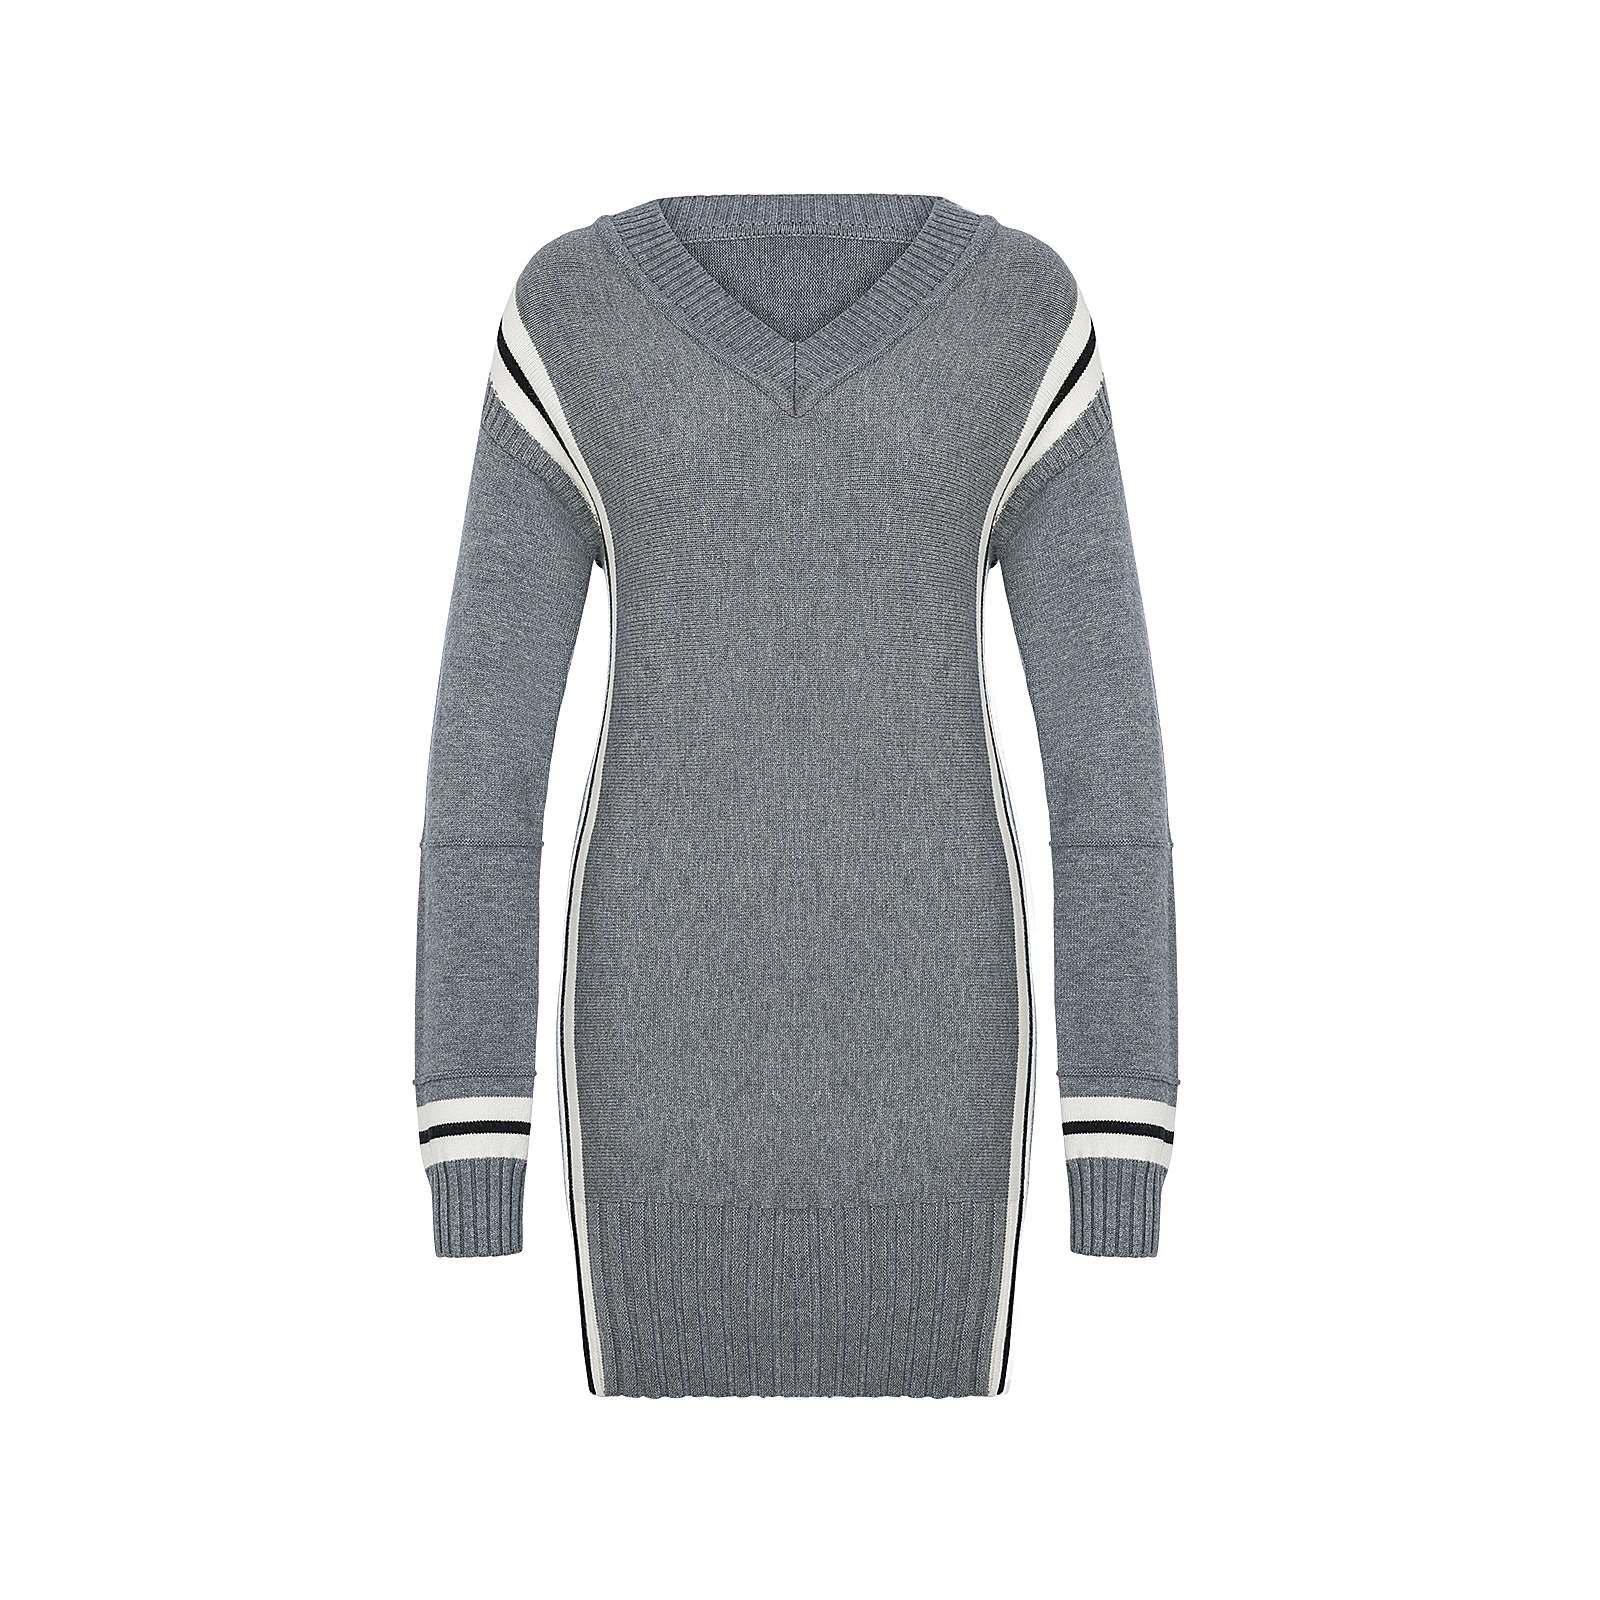 05de303a82e977 Million X Women Damen Long-Pullover Elenore Pullover grau Damen Gr. 44